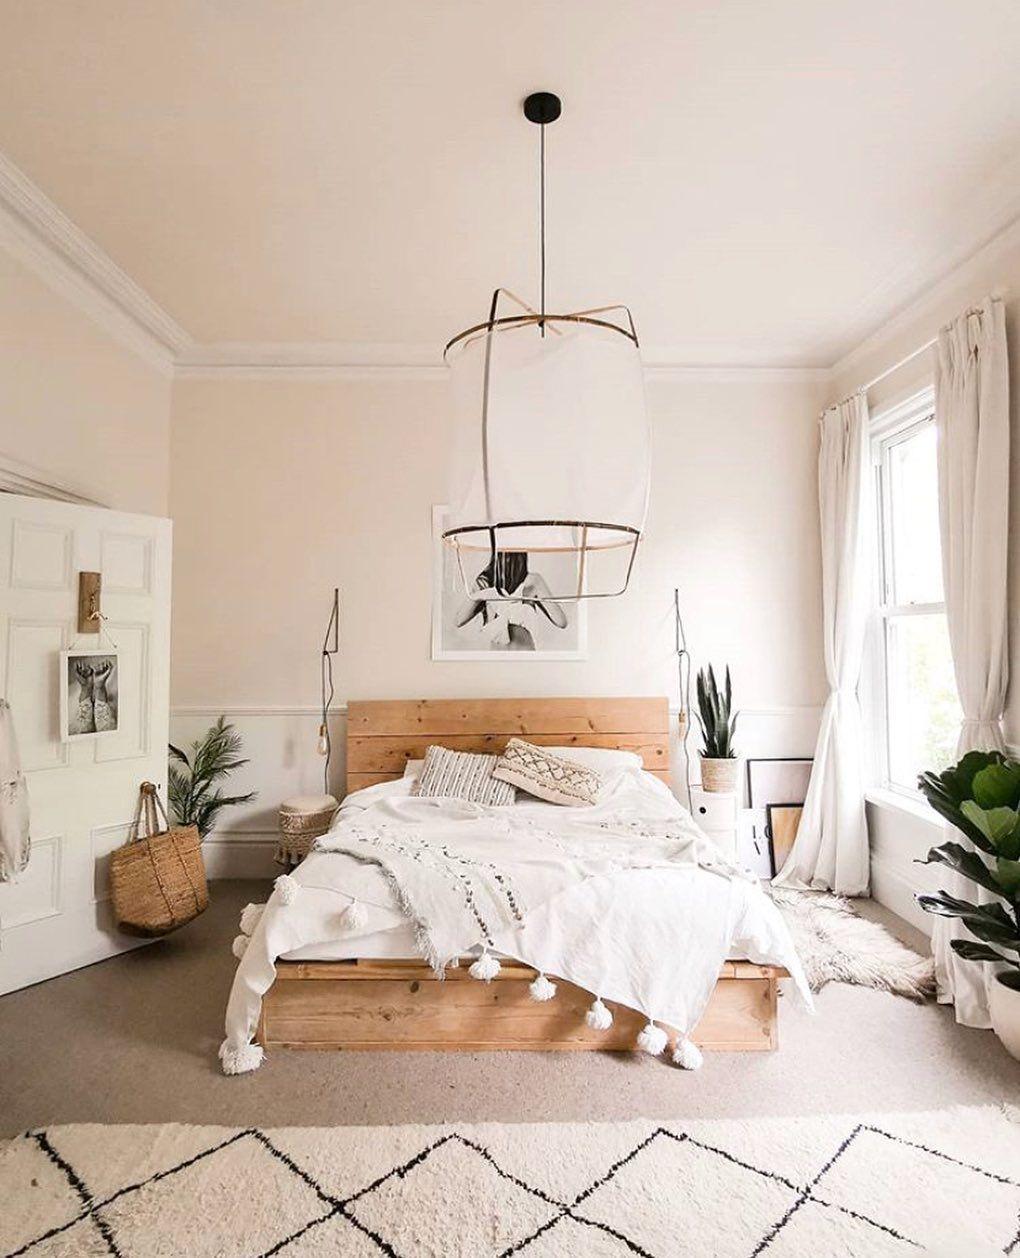 Lonny On Instagram Bedtime Beckons The Neutral Nuanced Bedroom Of Sallyfazelihome Simple Bedroom Room Ideas Bedroom Bedroom Makeover Cool bedroom ideas lonny